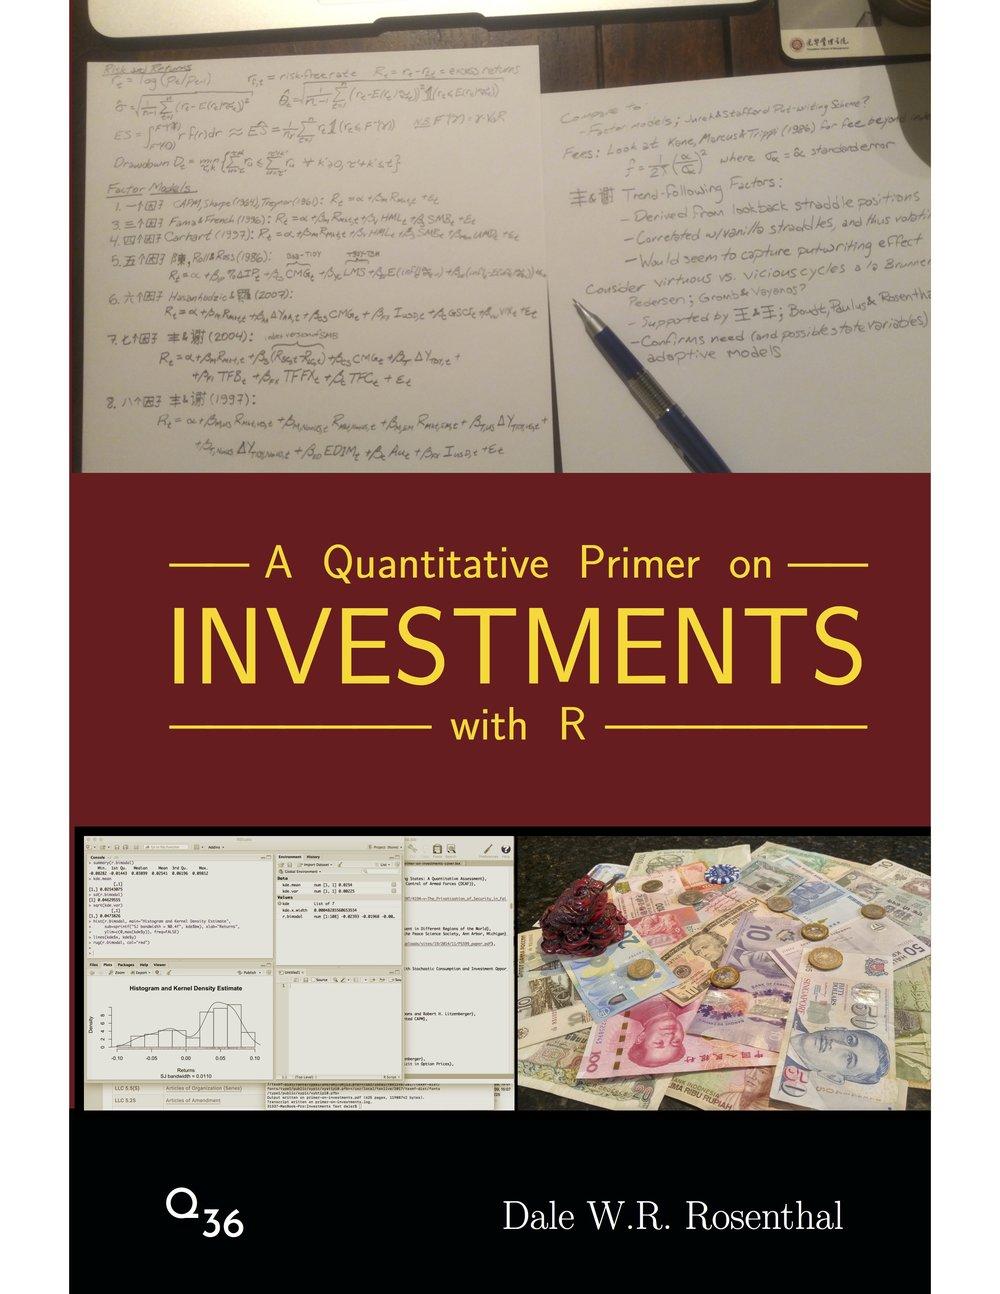 primer-on-investments-cover-image.jpg